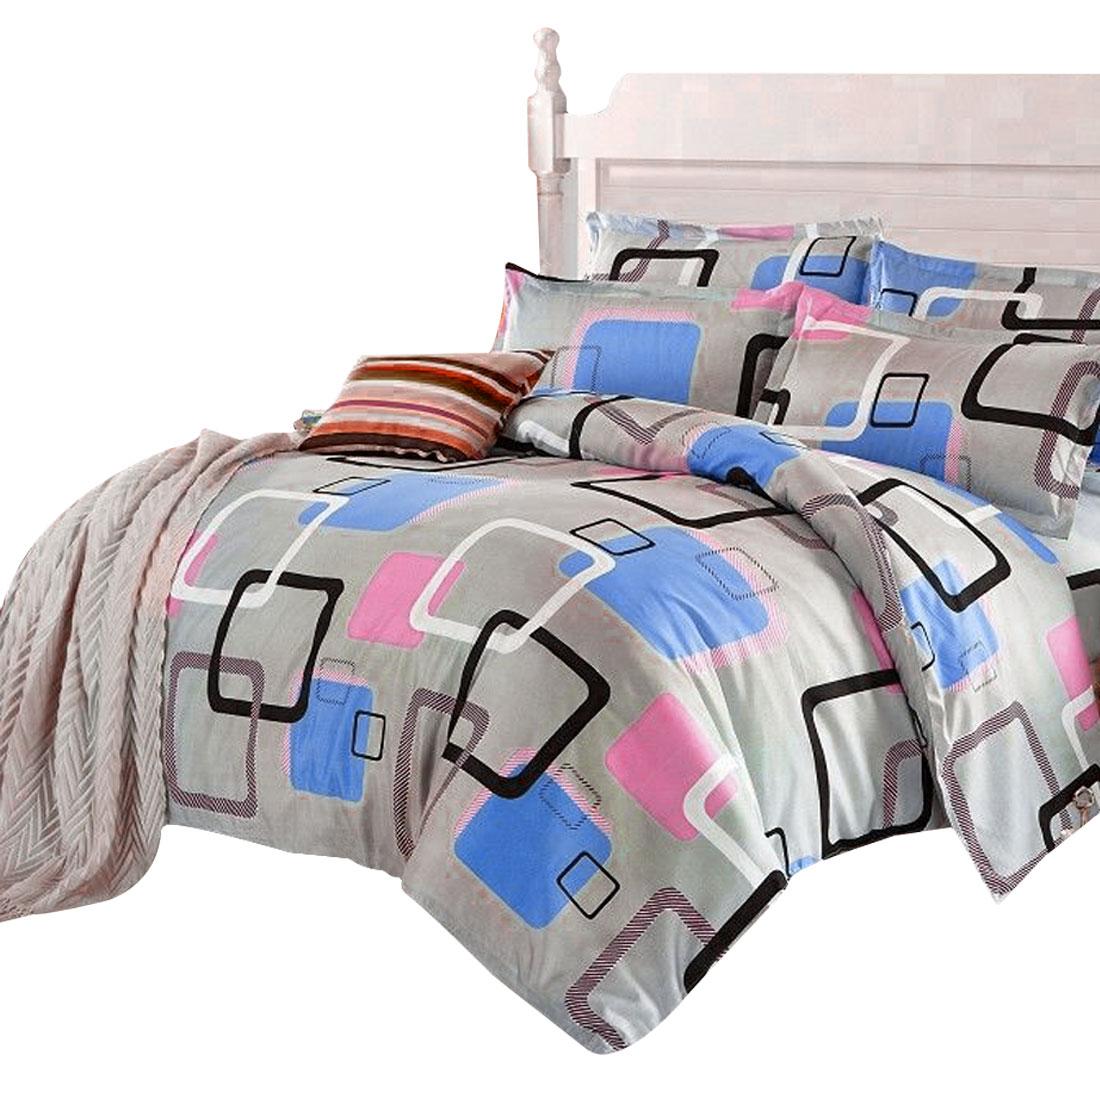 Colorful Square Pattern Duvet Cover Pillow Case Quilt Cover Bedding Set Double